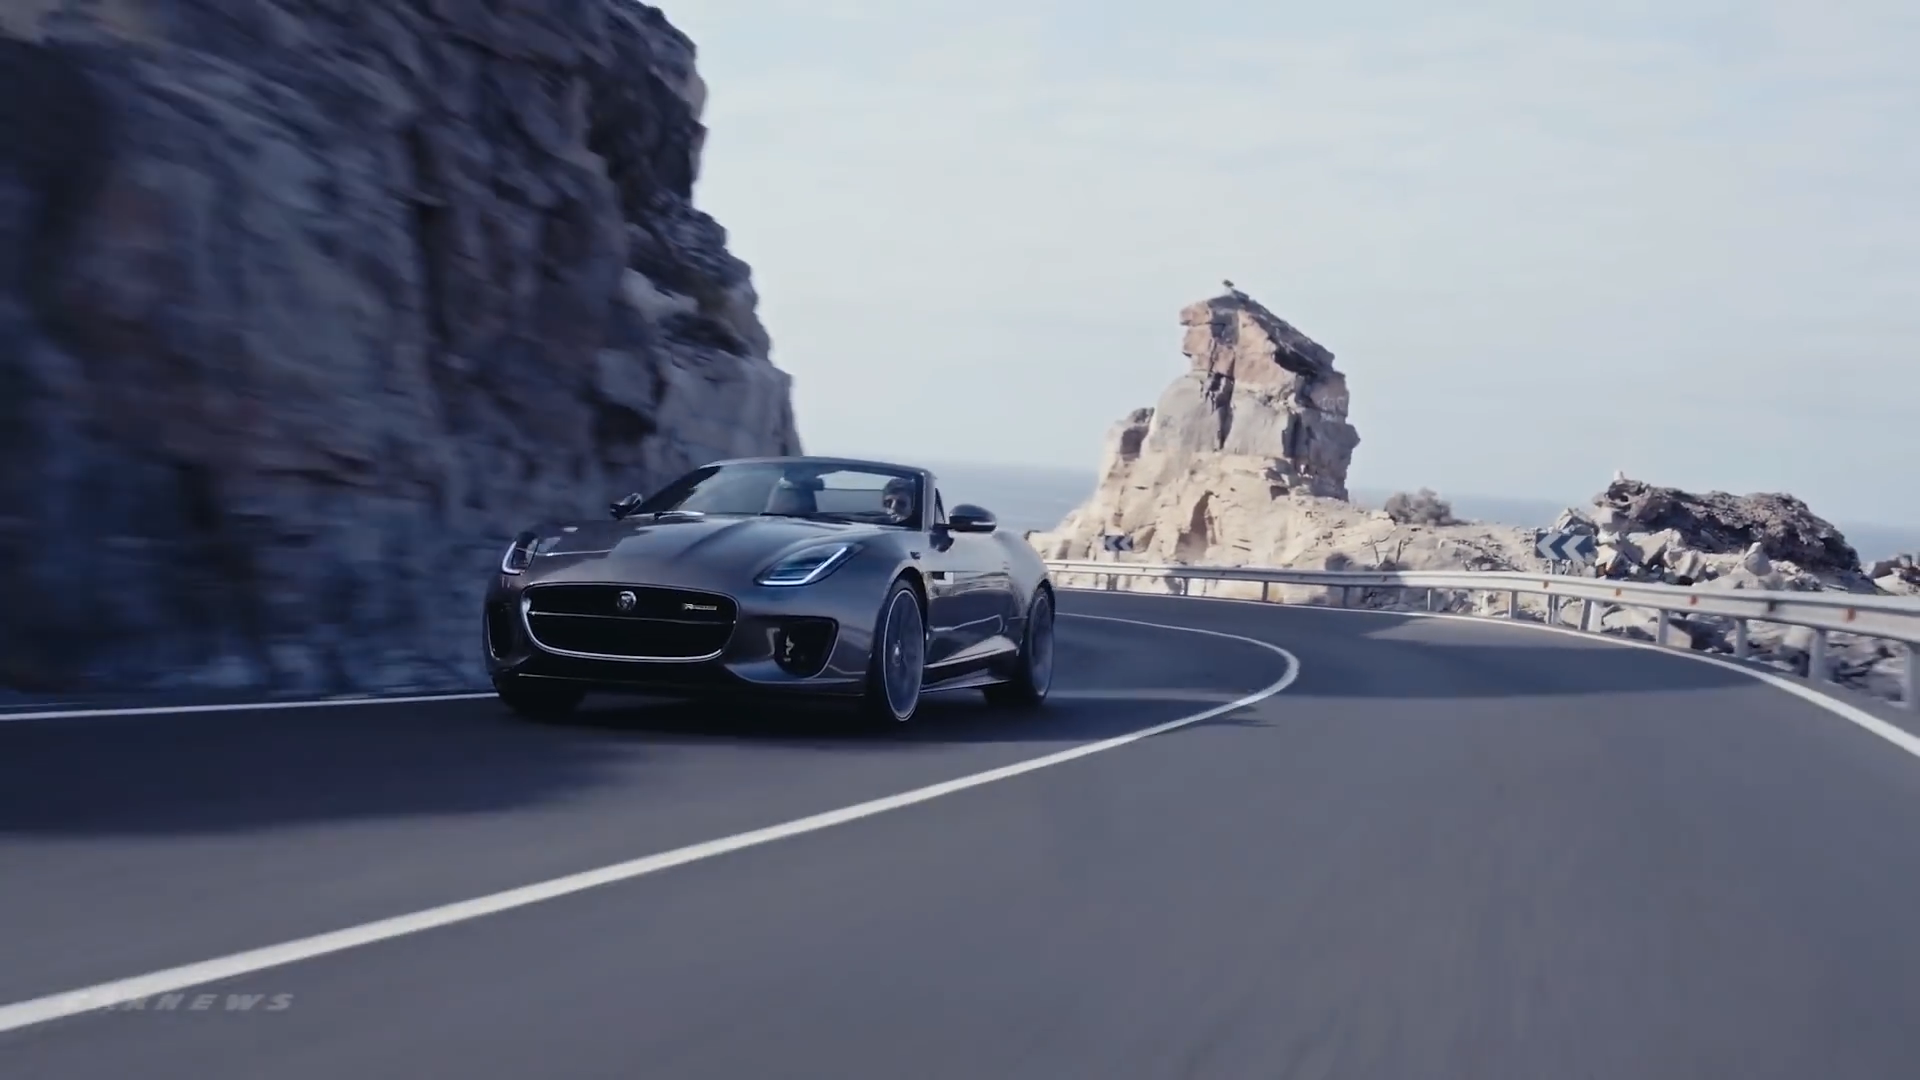 2018-Jaguar-F-TYPE.mp4.00_05_08_06.Still010(1).png